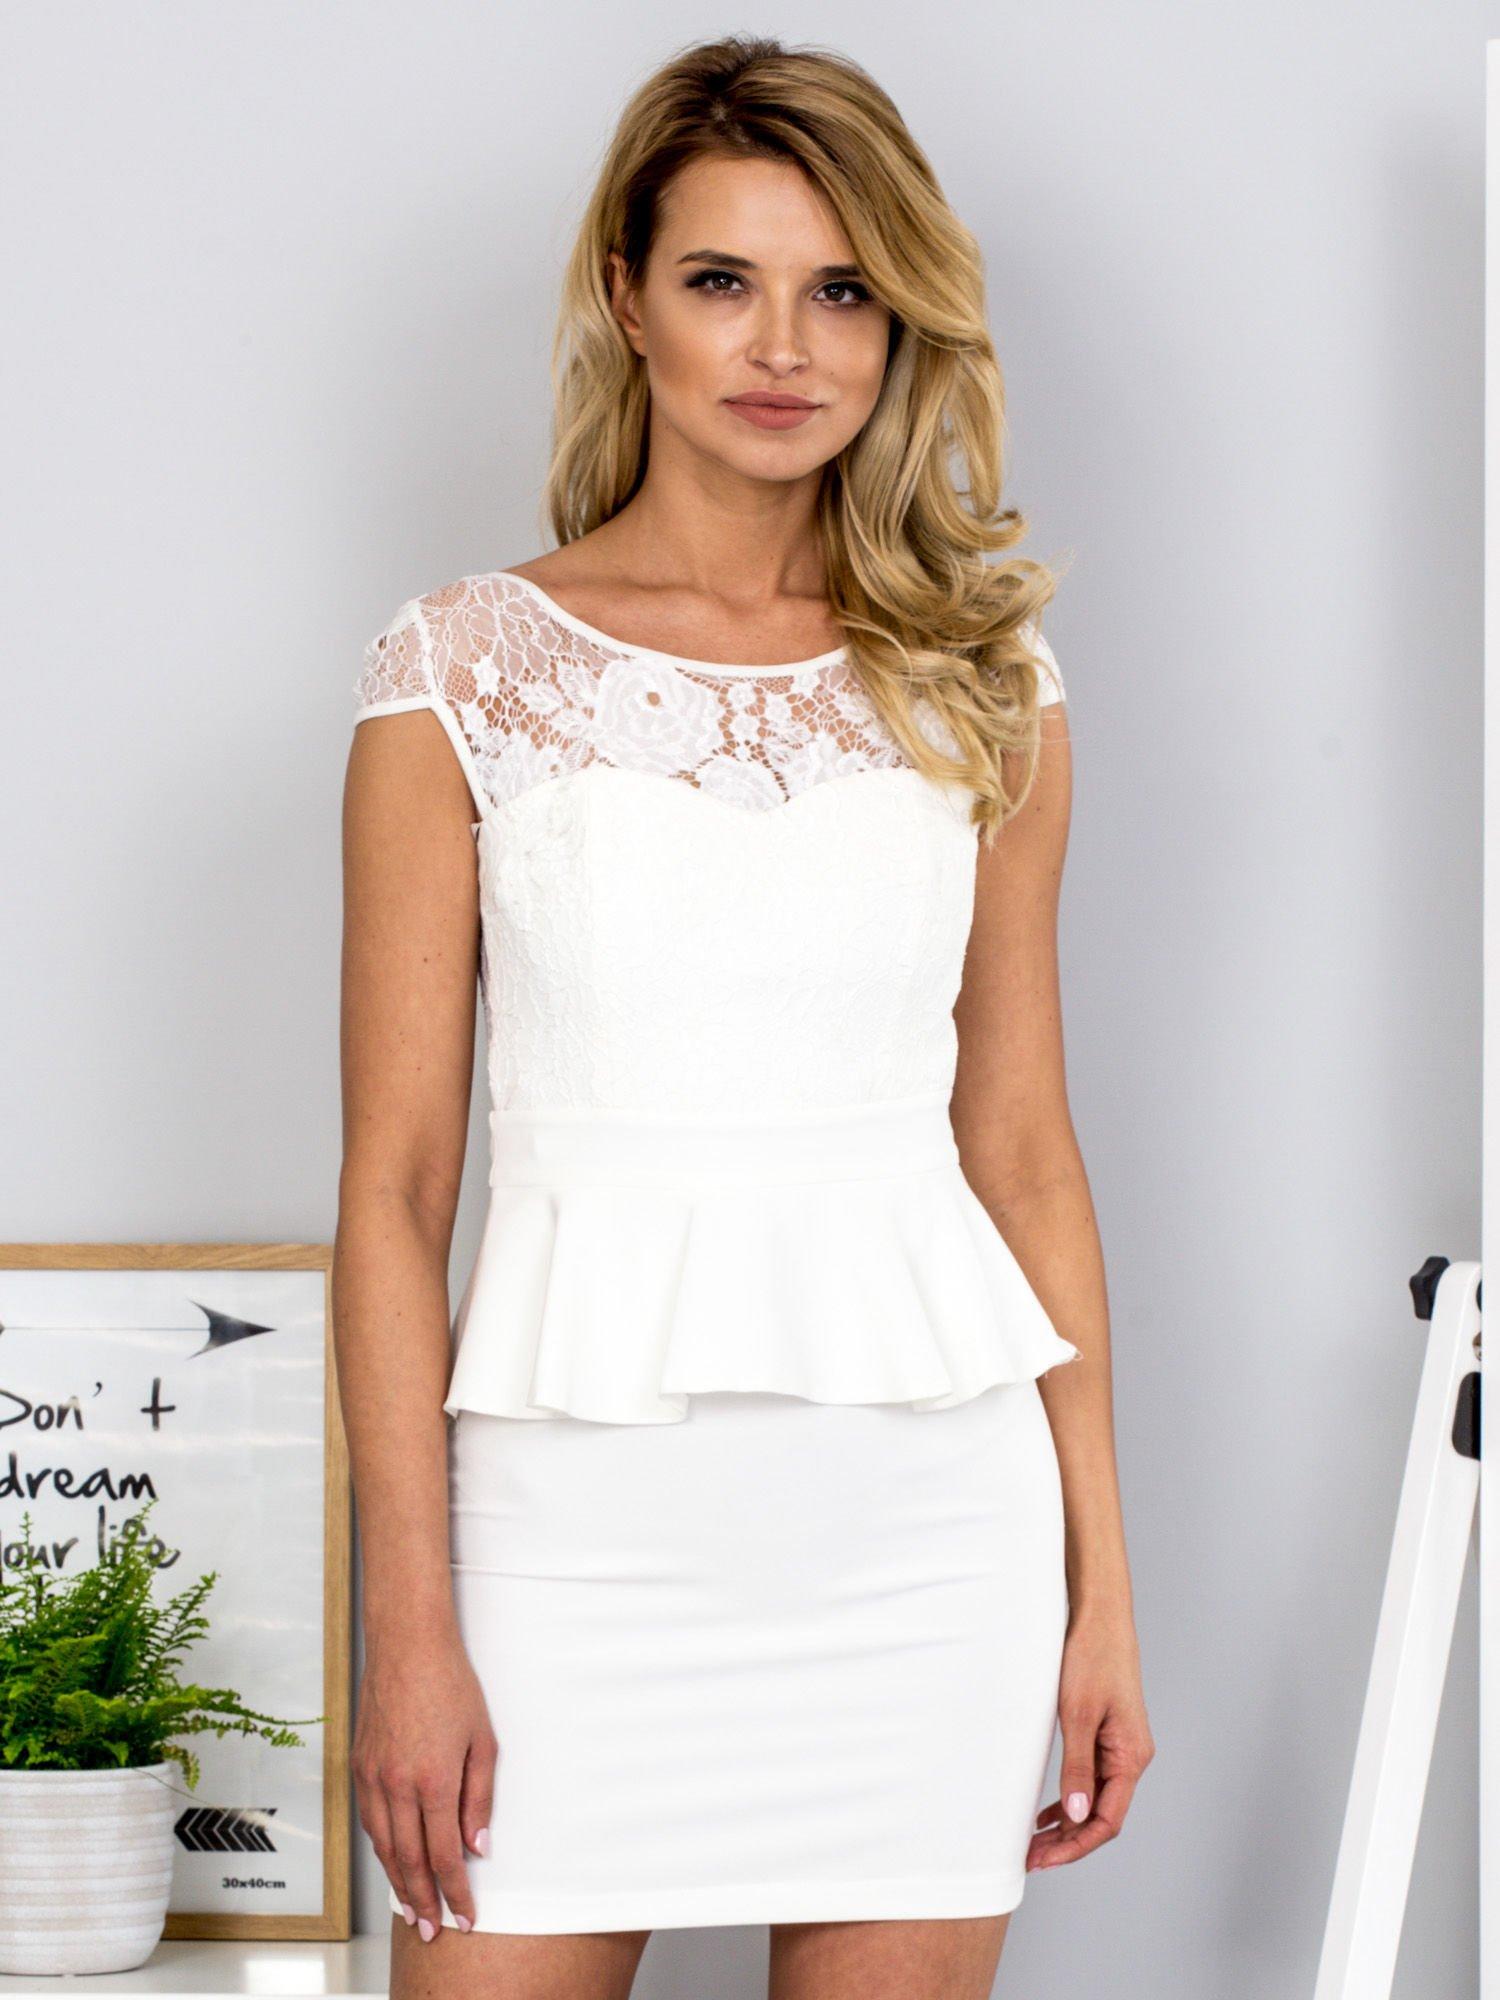 eb5aca5058 Ecru sukienka z baskinką - Sukienka koktajlowa - sklep eButik.pl